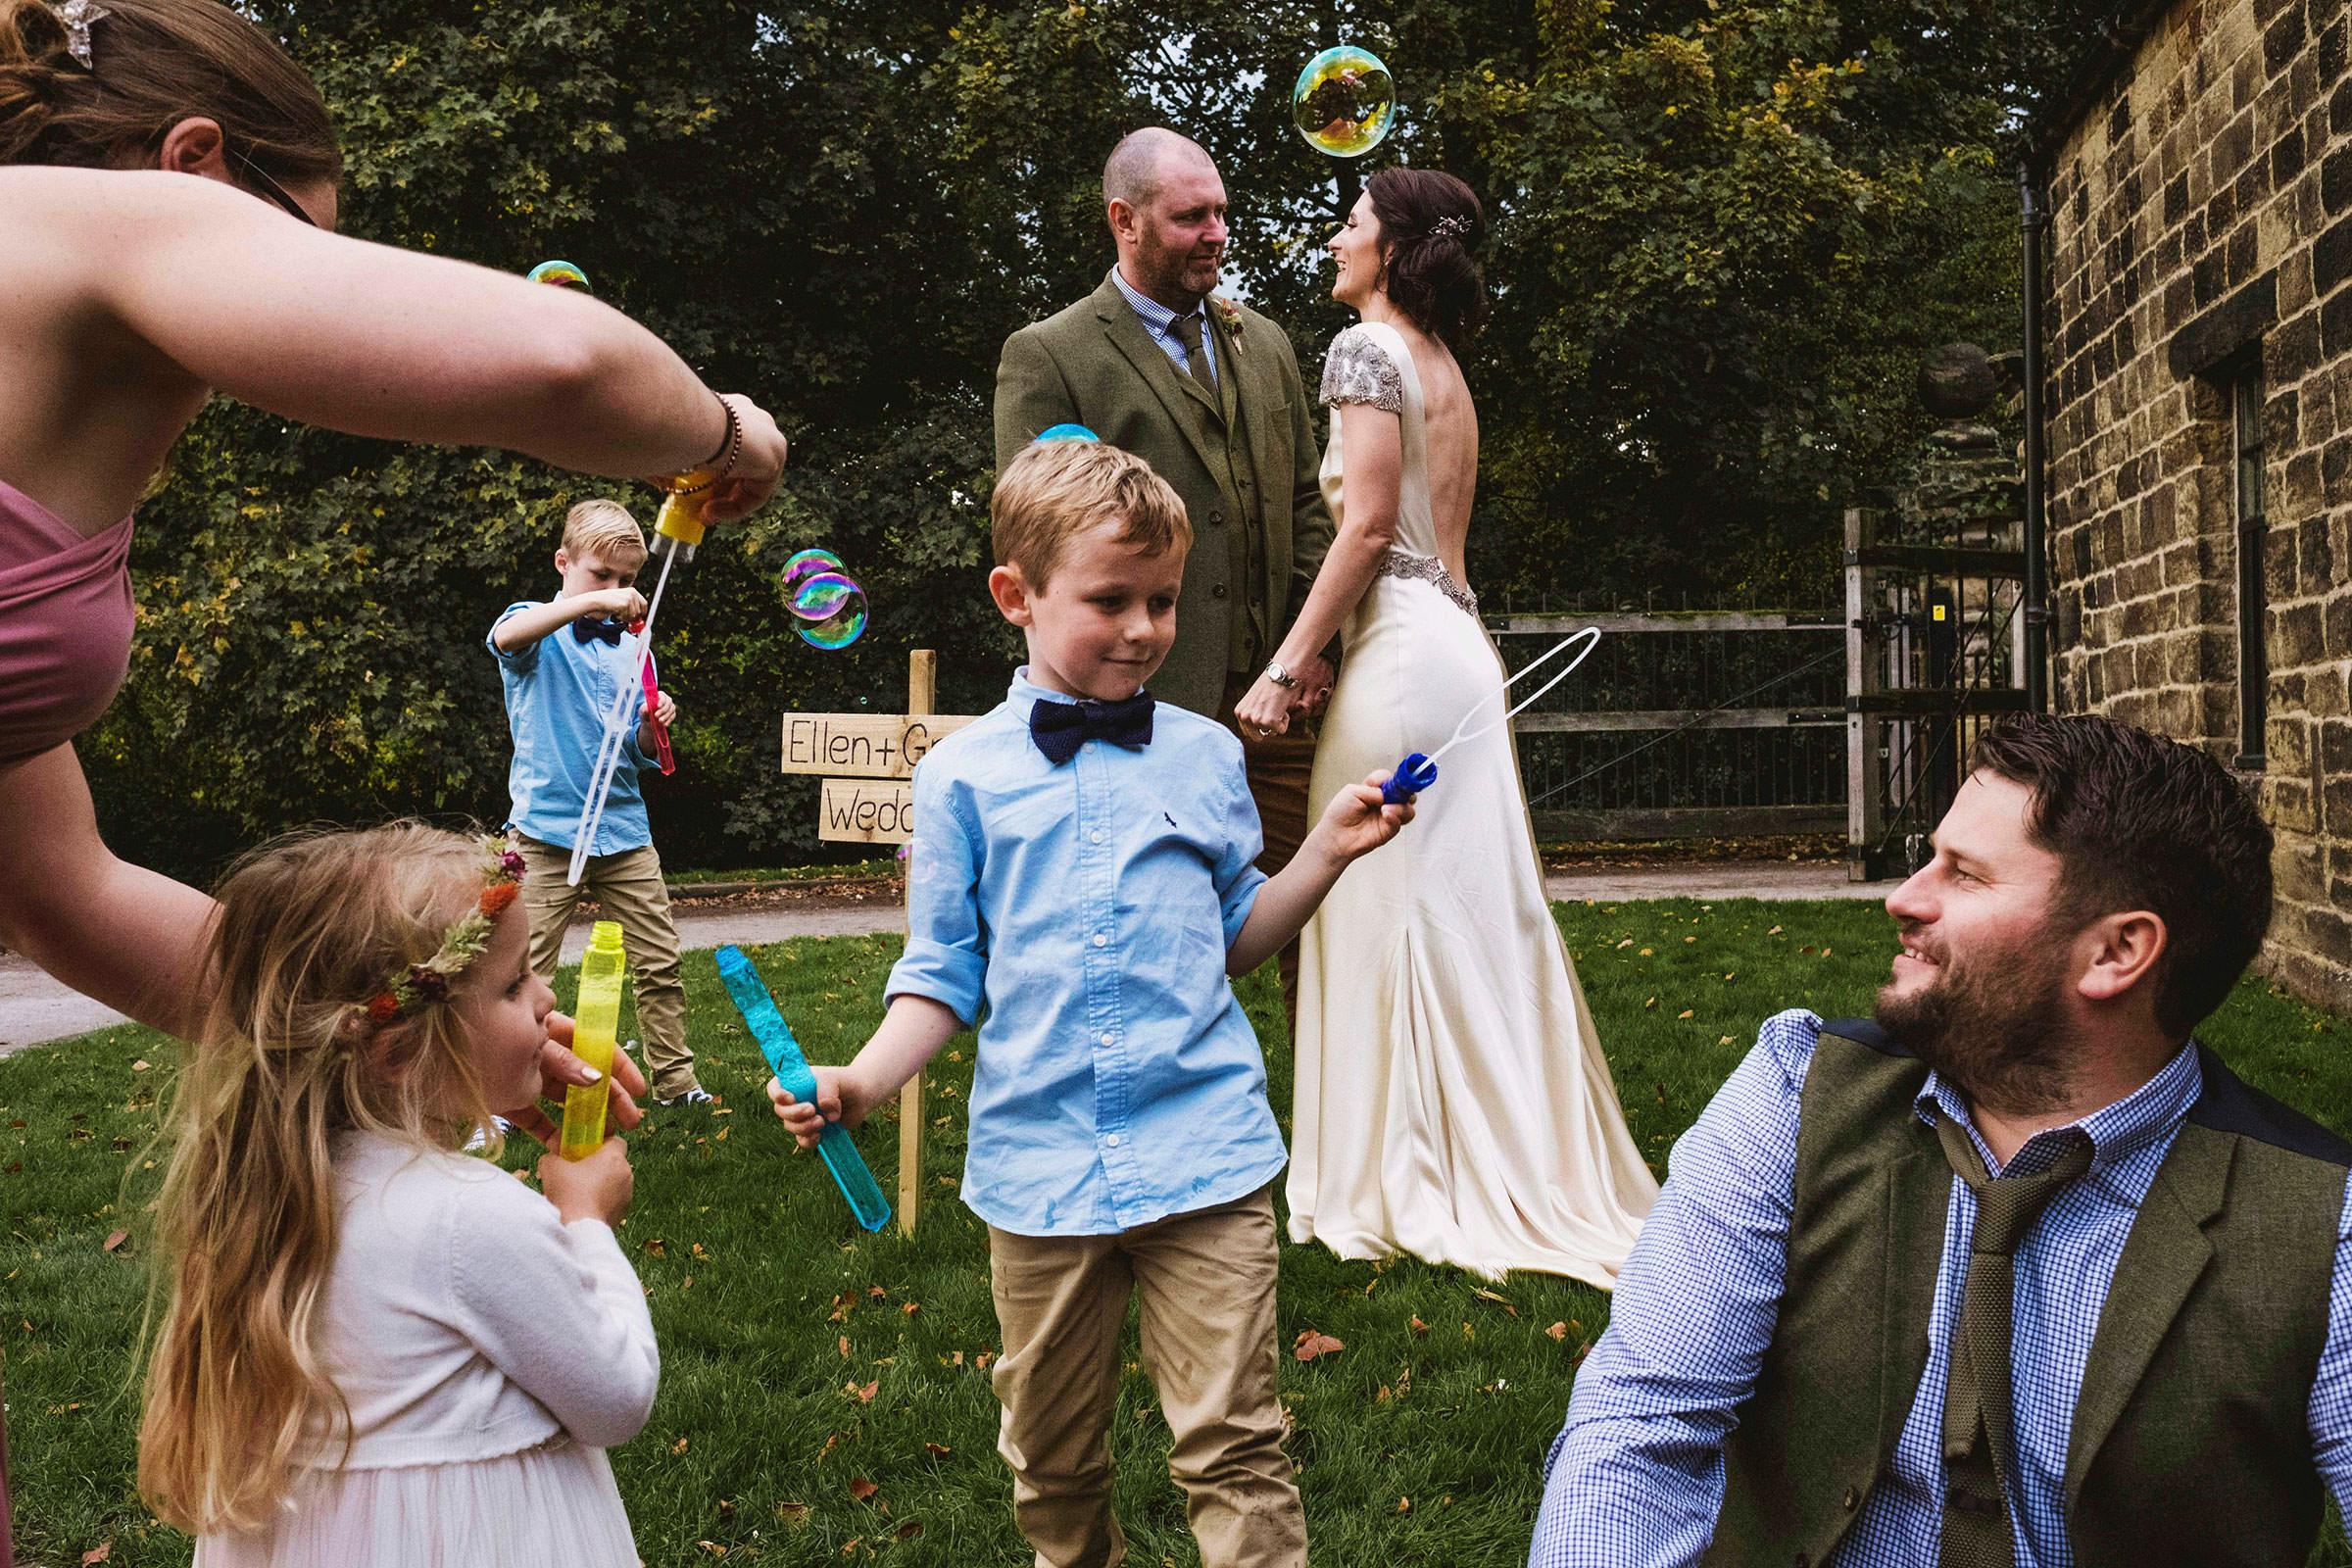 reportage-candid-wedding-photographers